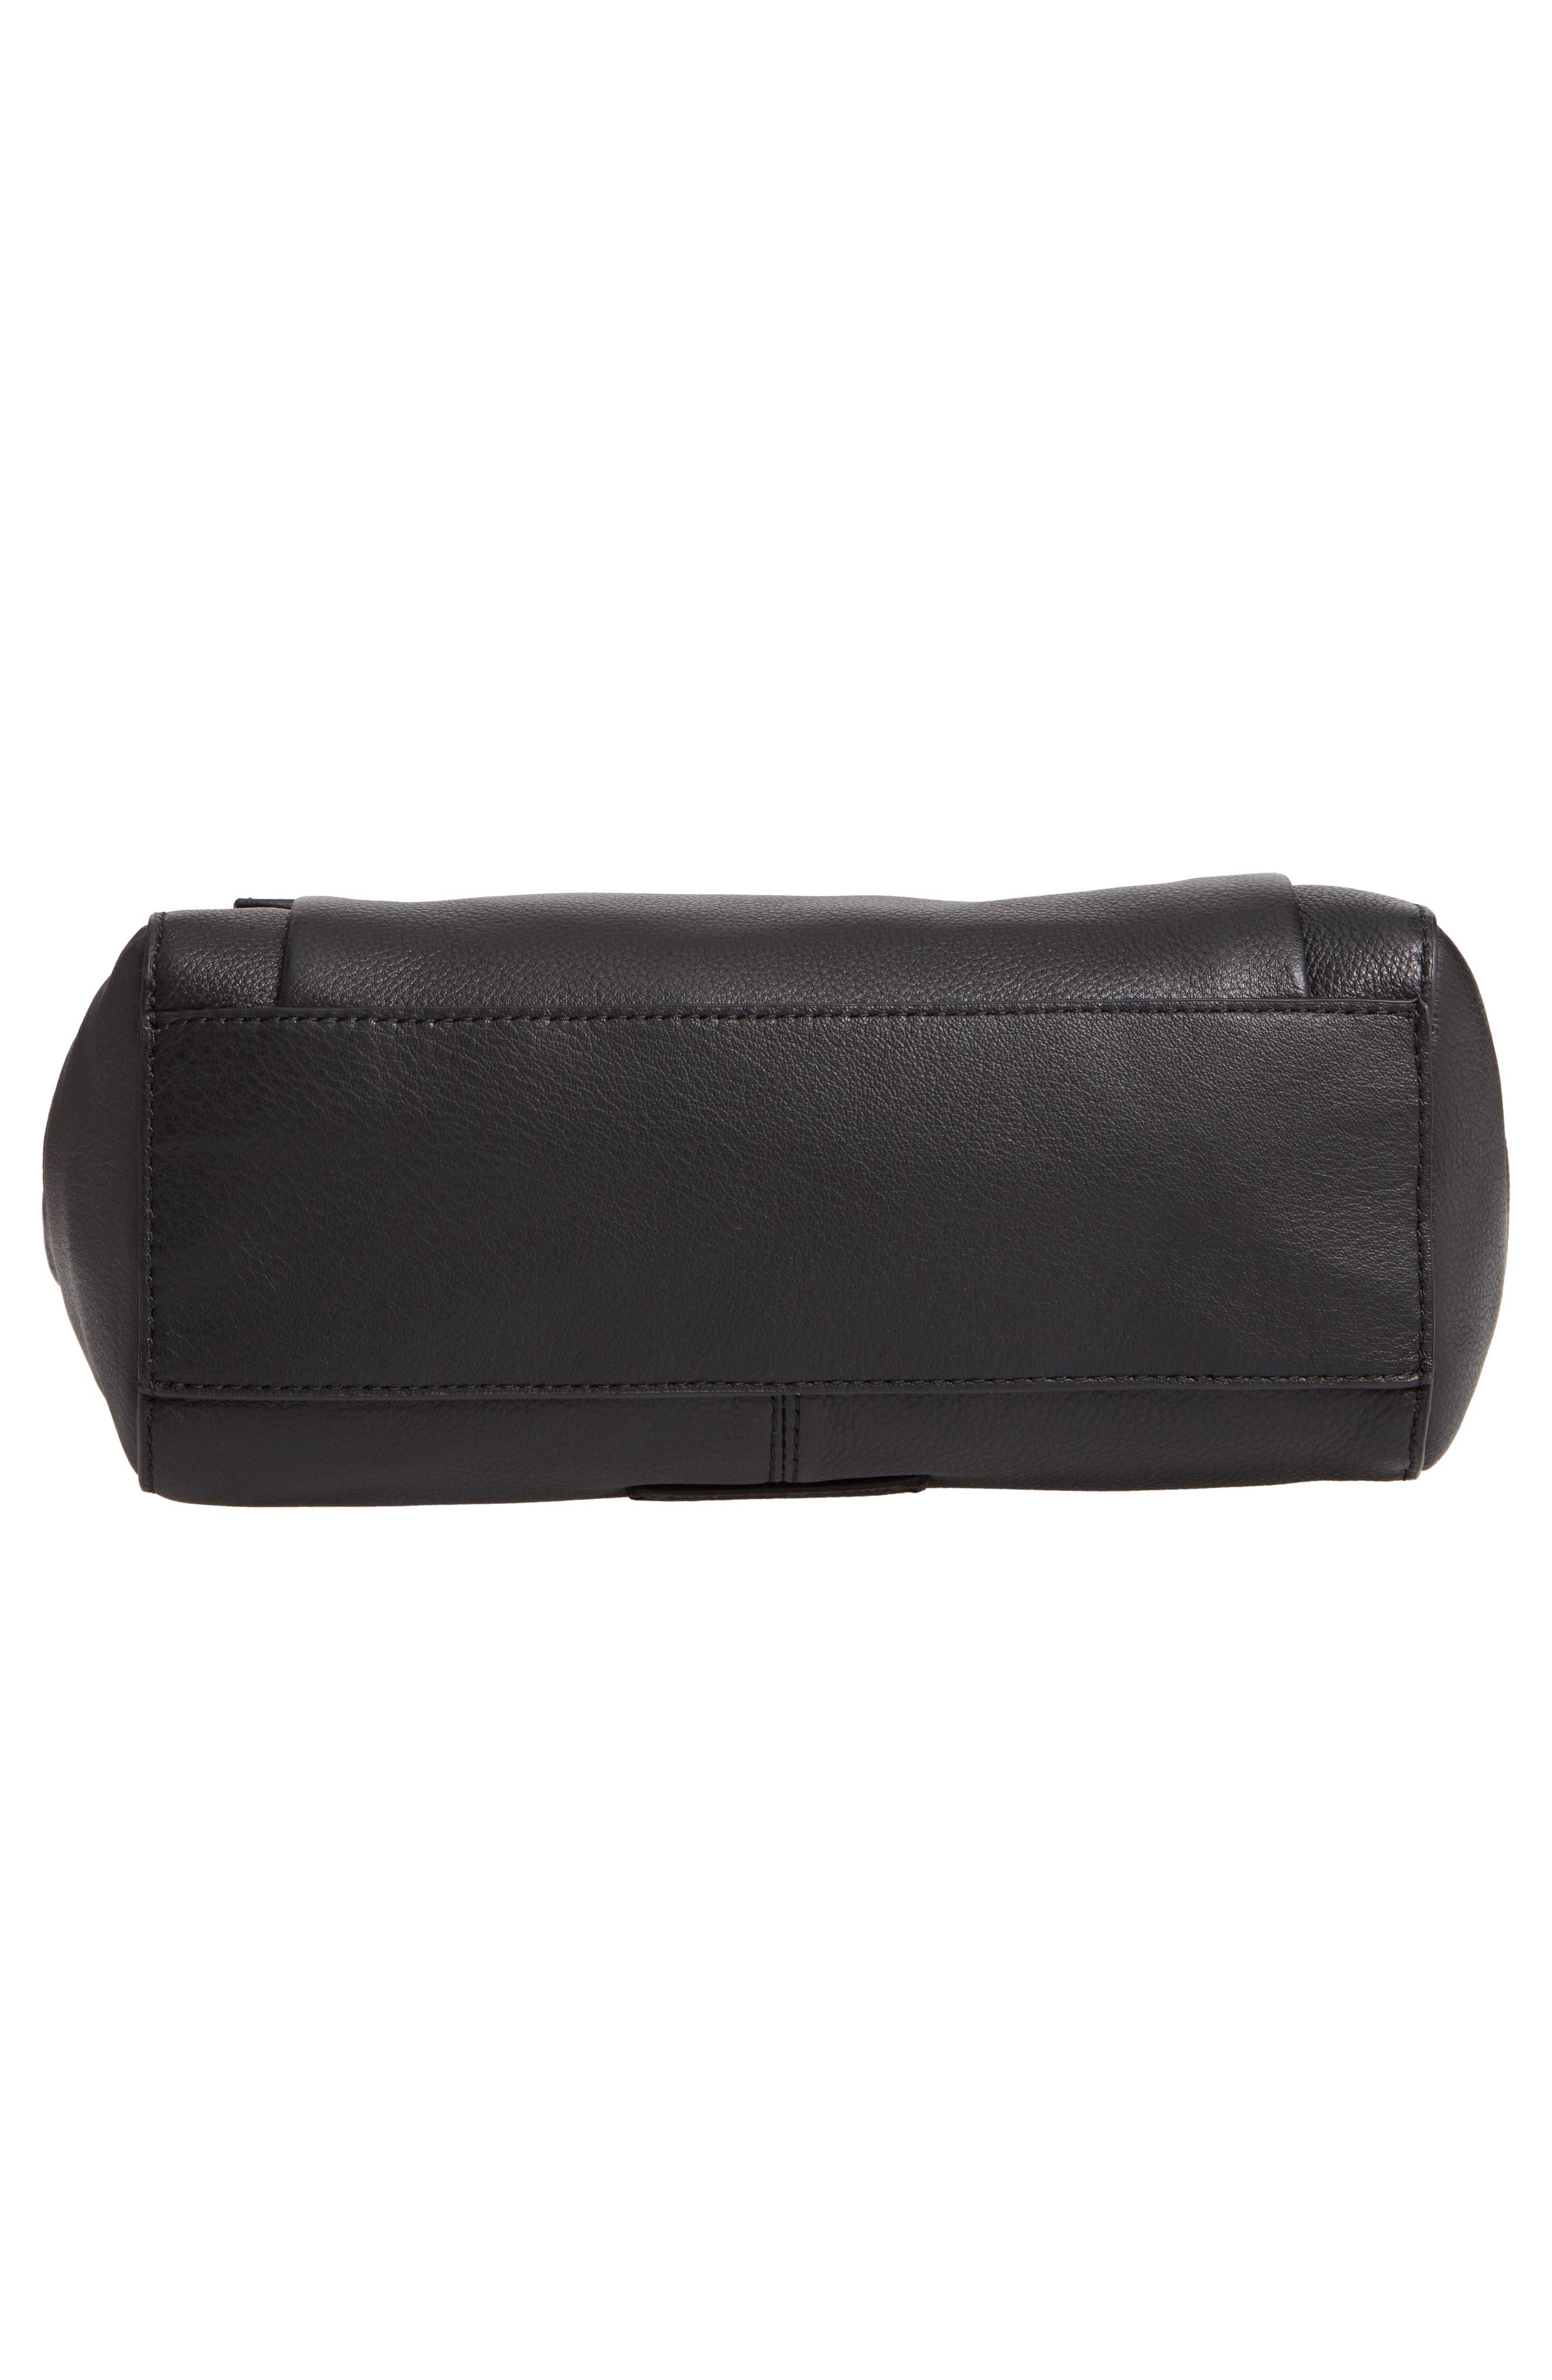 Leather Crossbody Bag,                             Alternate thumbnail 6, color,                             BLACK